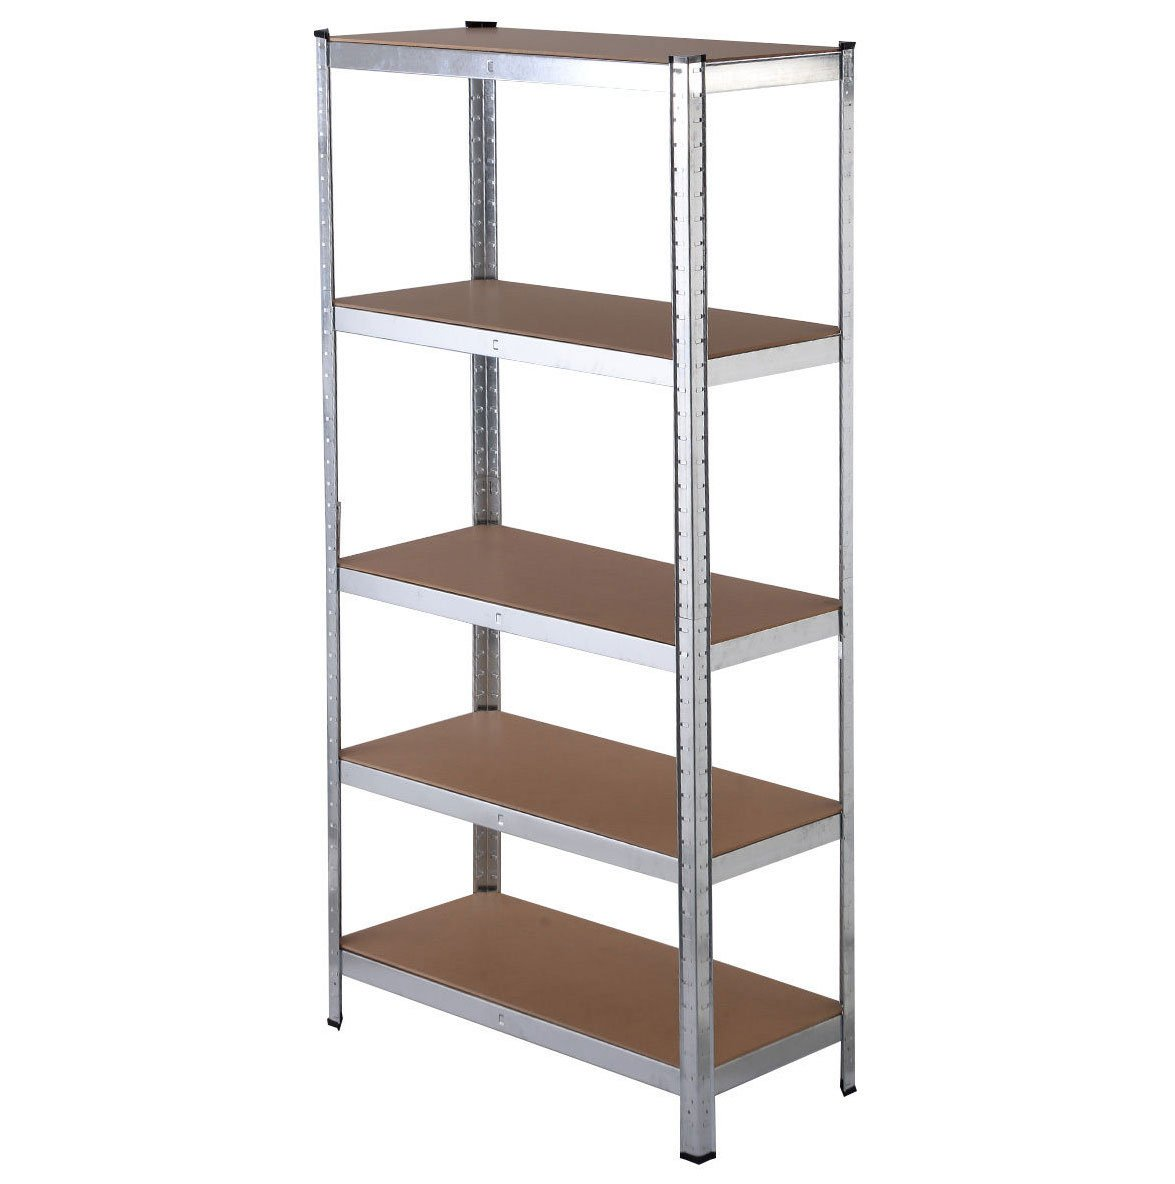 Adjustable 5 Level Heavy Duty Shelf Garage Steel Metal Storage Rack